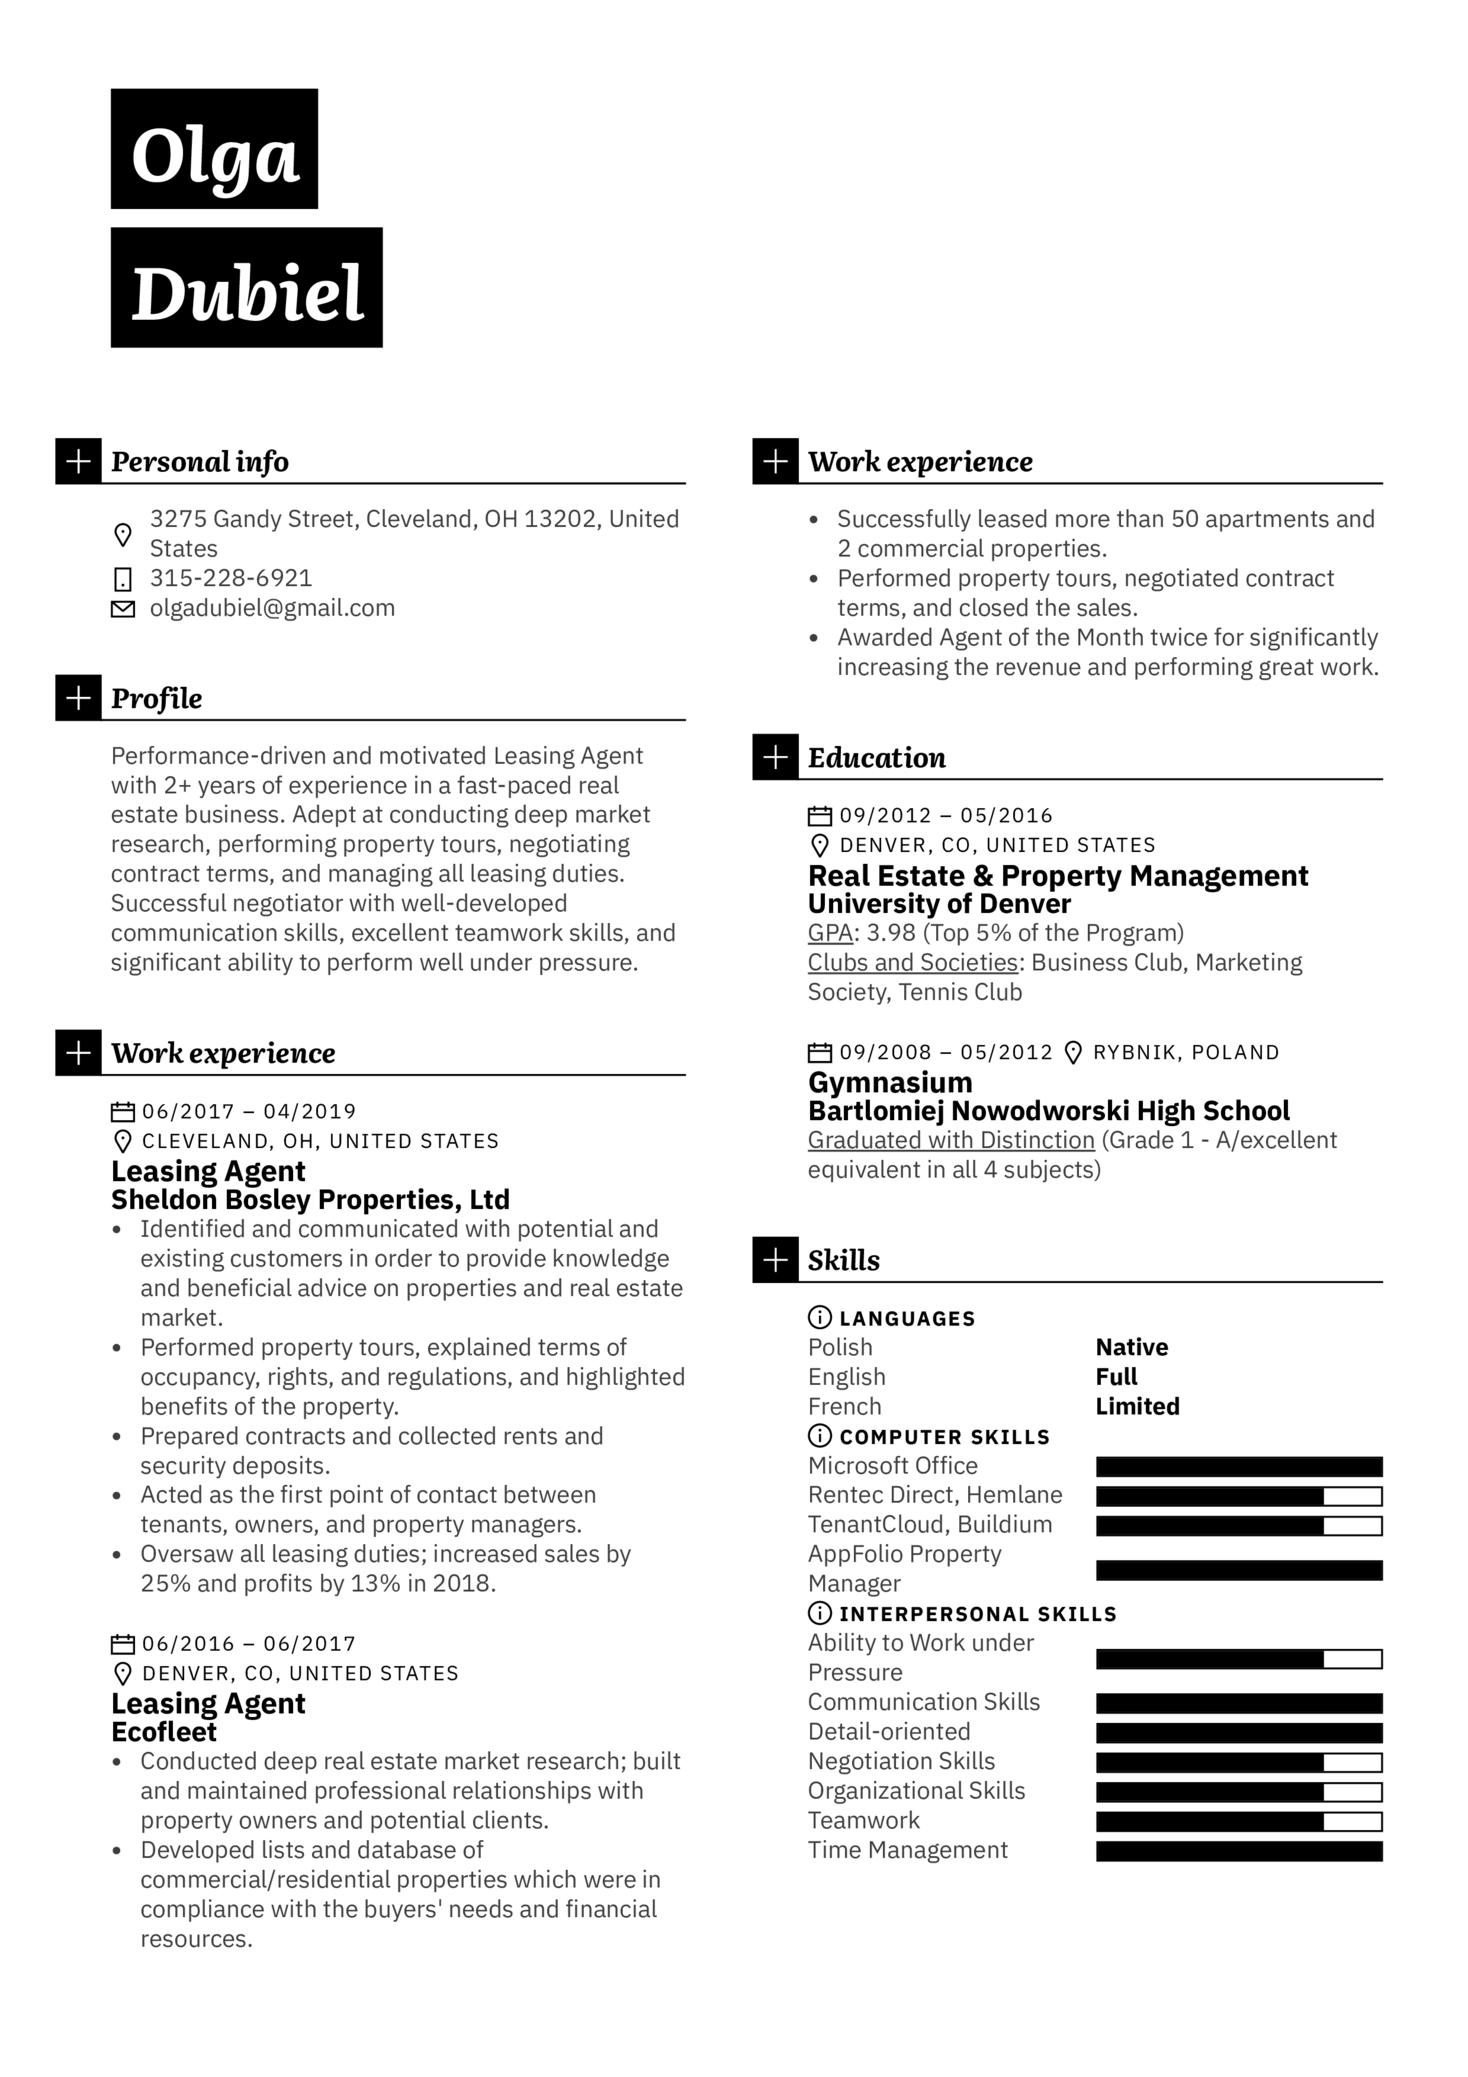 Leasing Agent Resume Sample (Part 1)